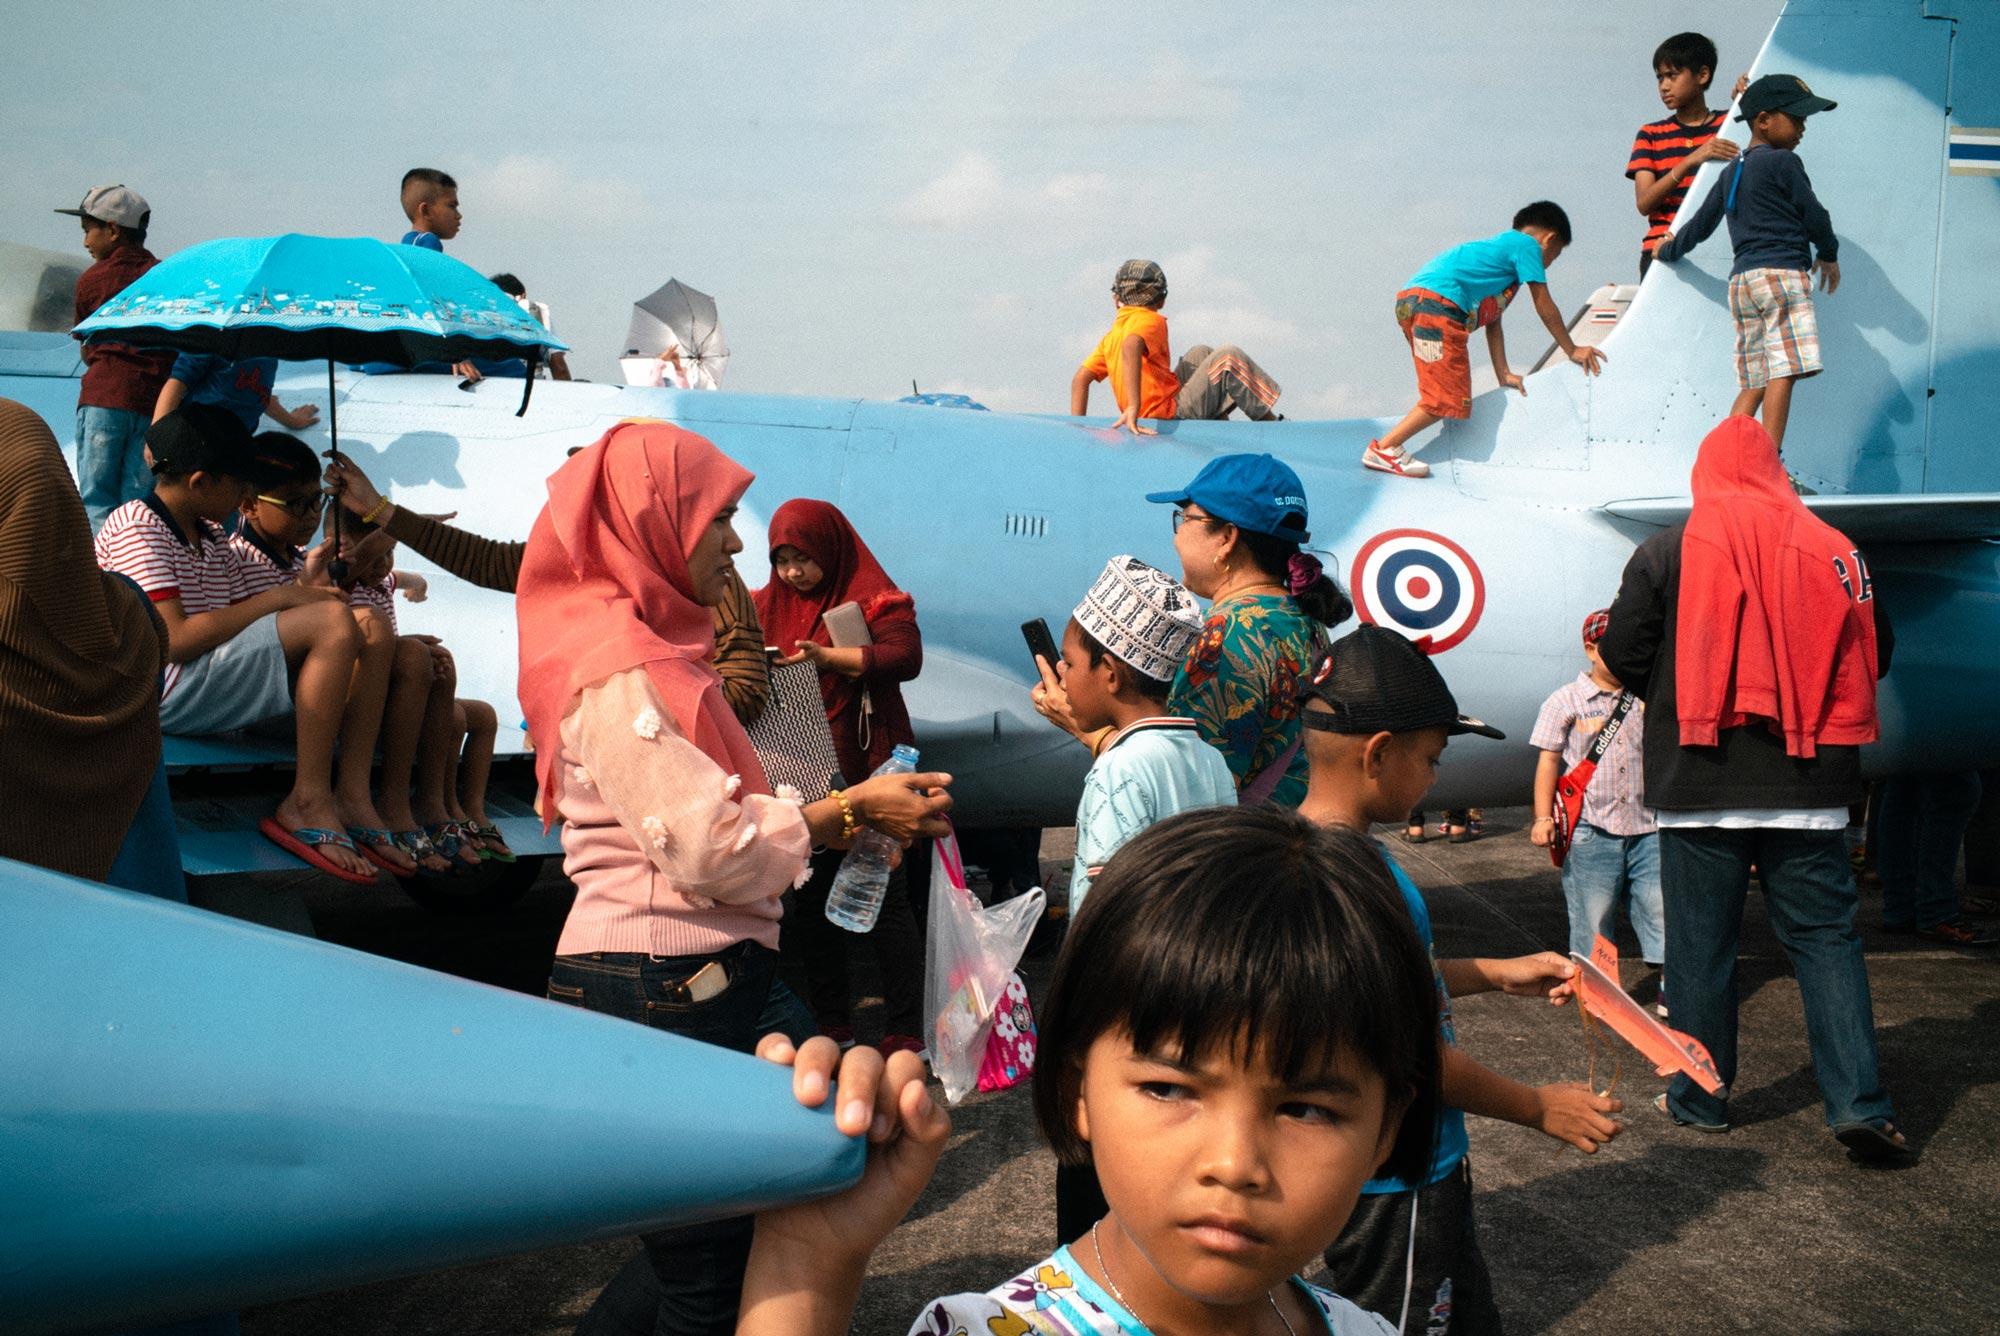 Street photography in Thailandia dal fotografo Sakulchai Sikitkul